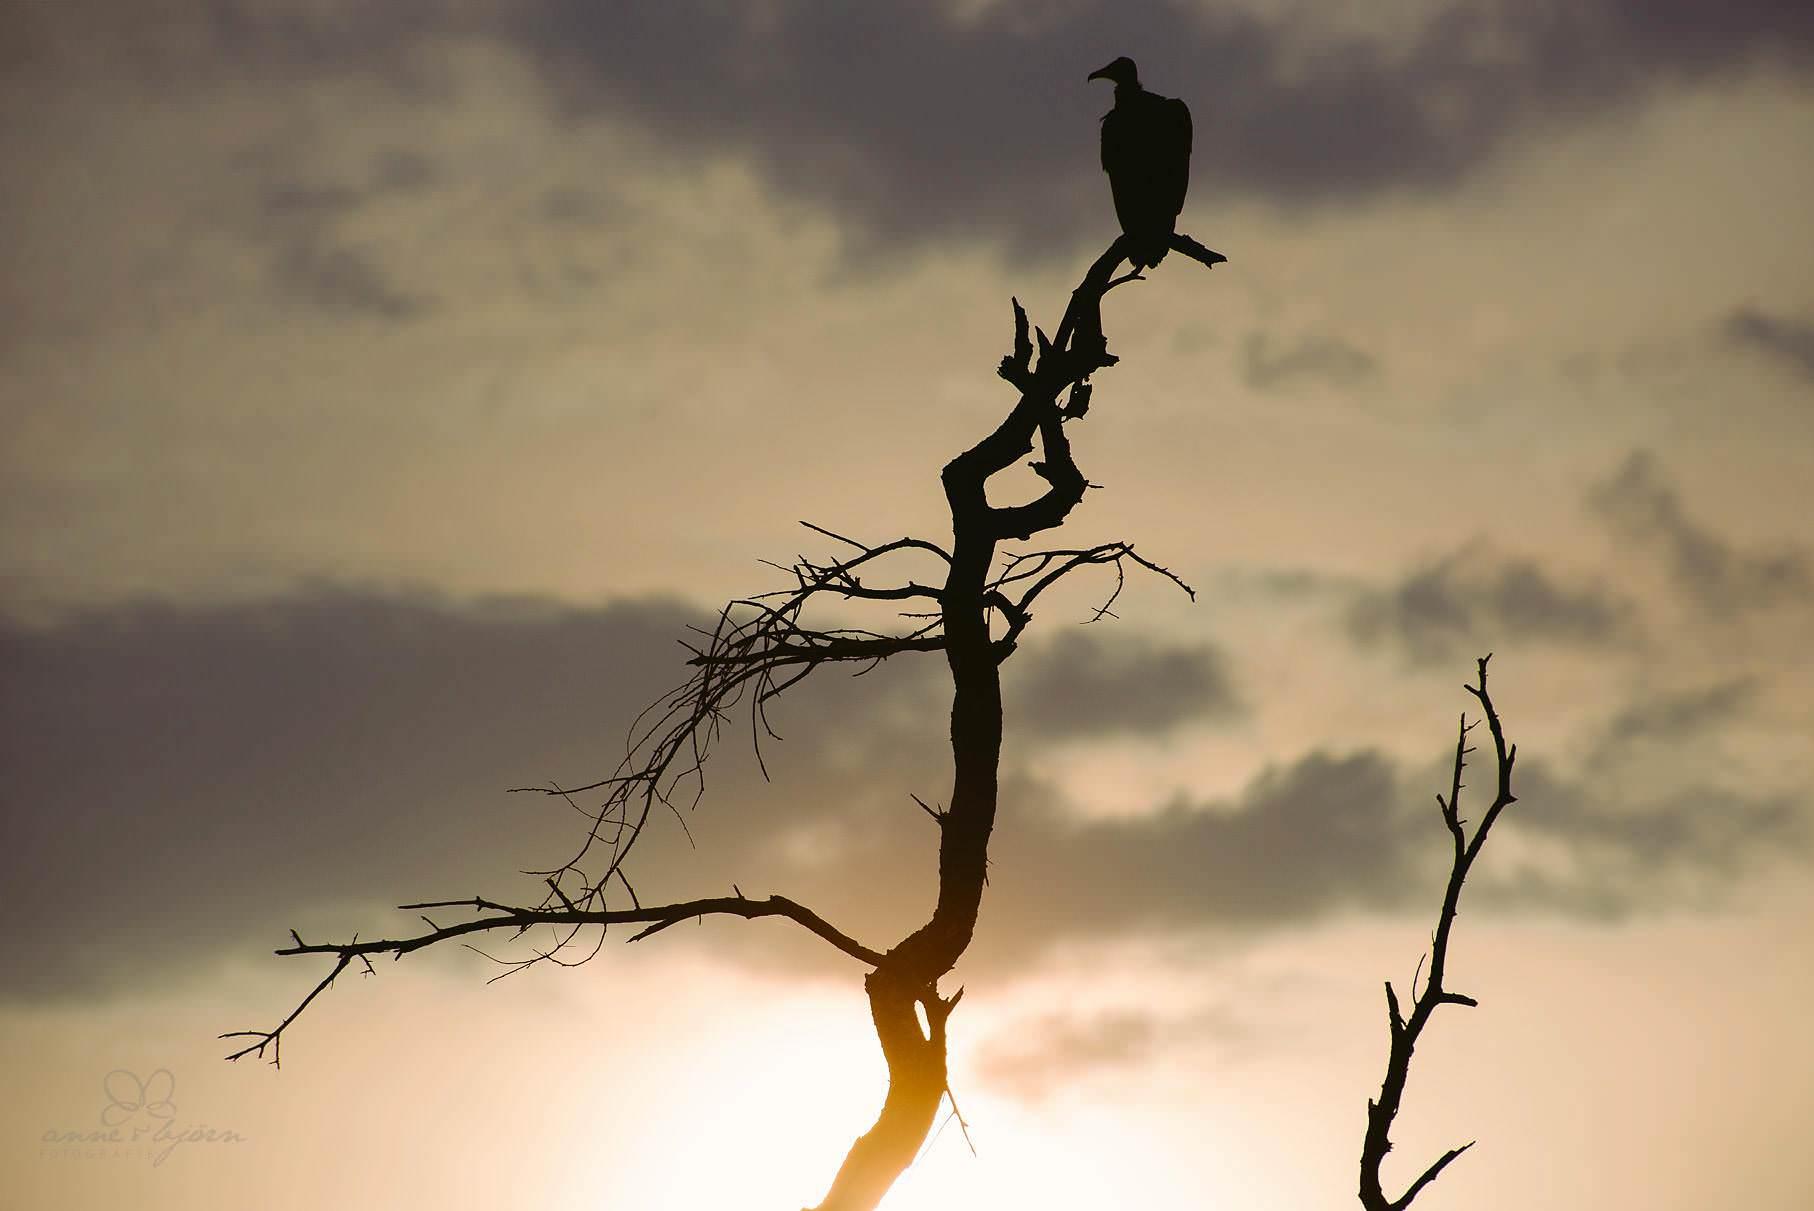 0080 tansania nd6 8580 anne bjoern fotografie hochzeitsfotograf hamburg - This is Tanzania - Serengeti, Kilimanjaro & Sansibar